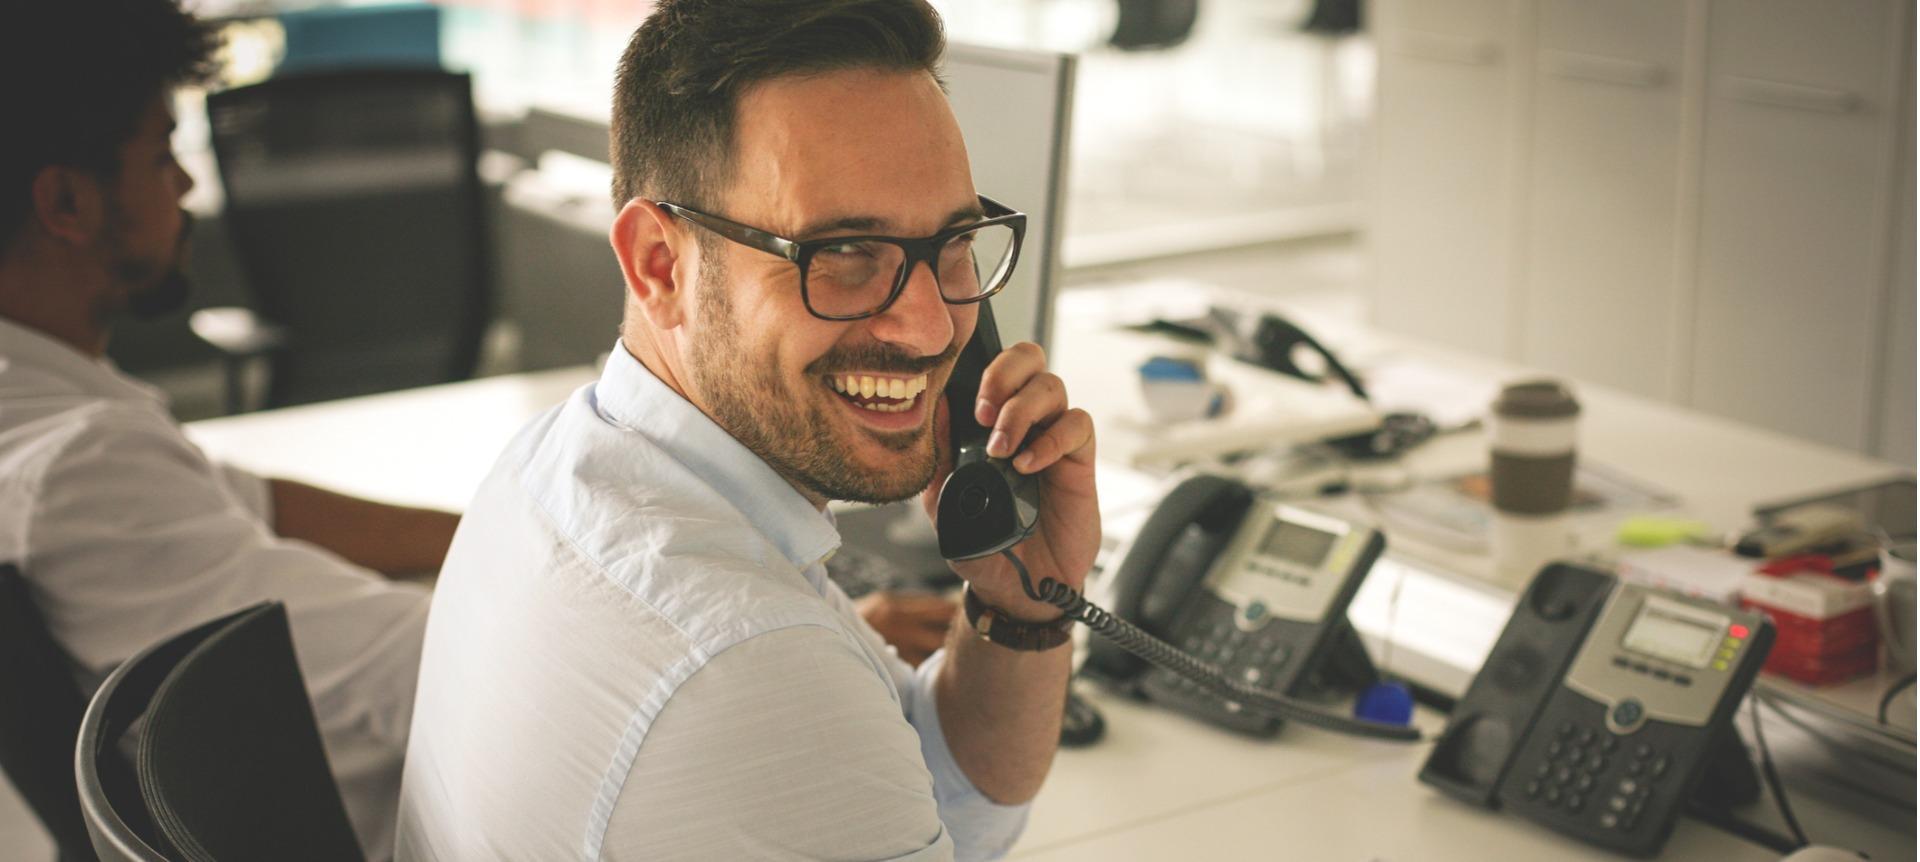 Business man having conversation on landline phone